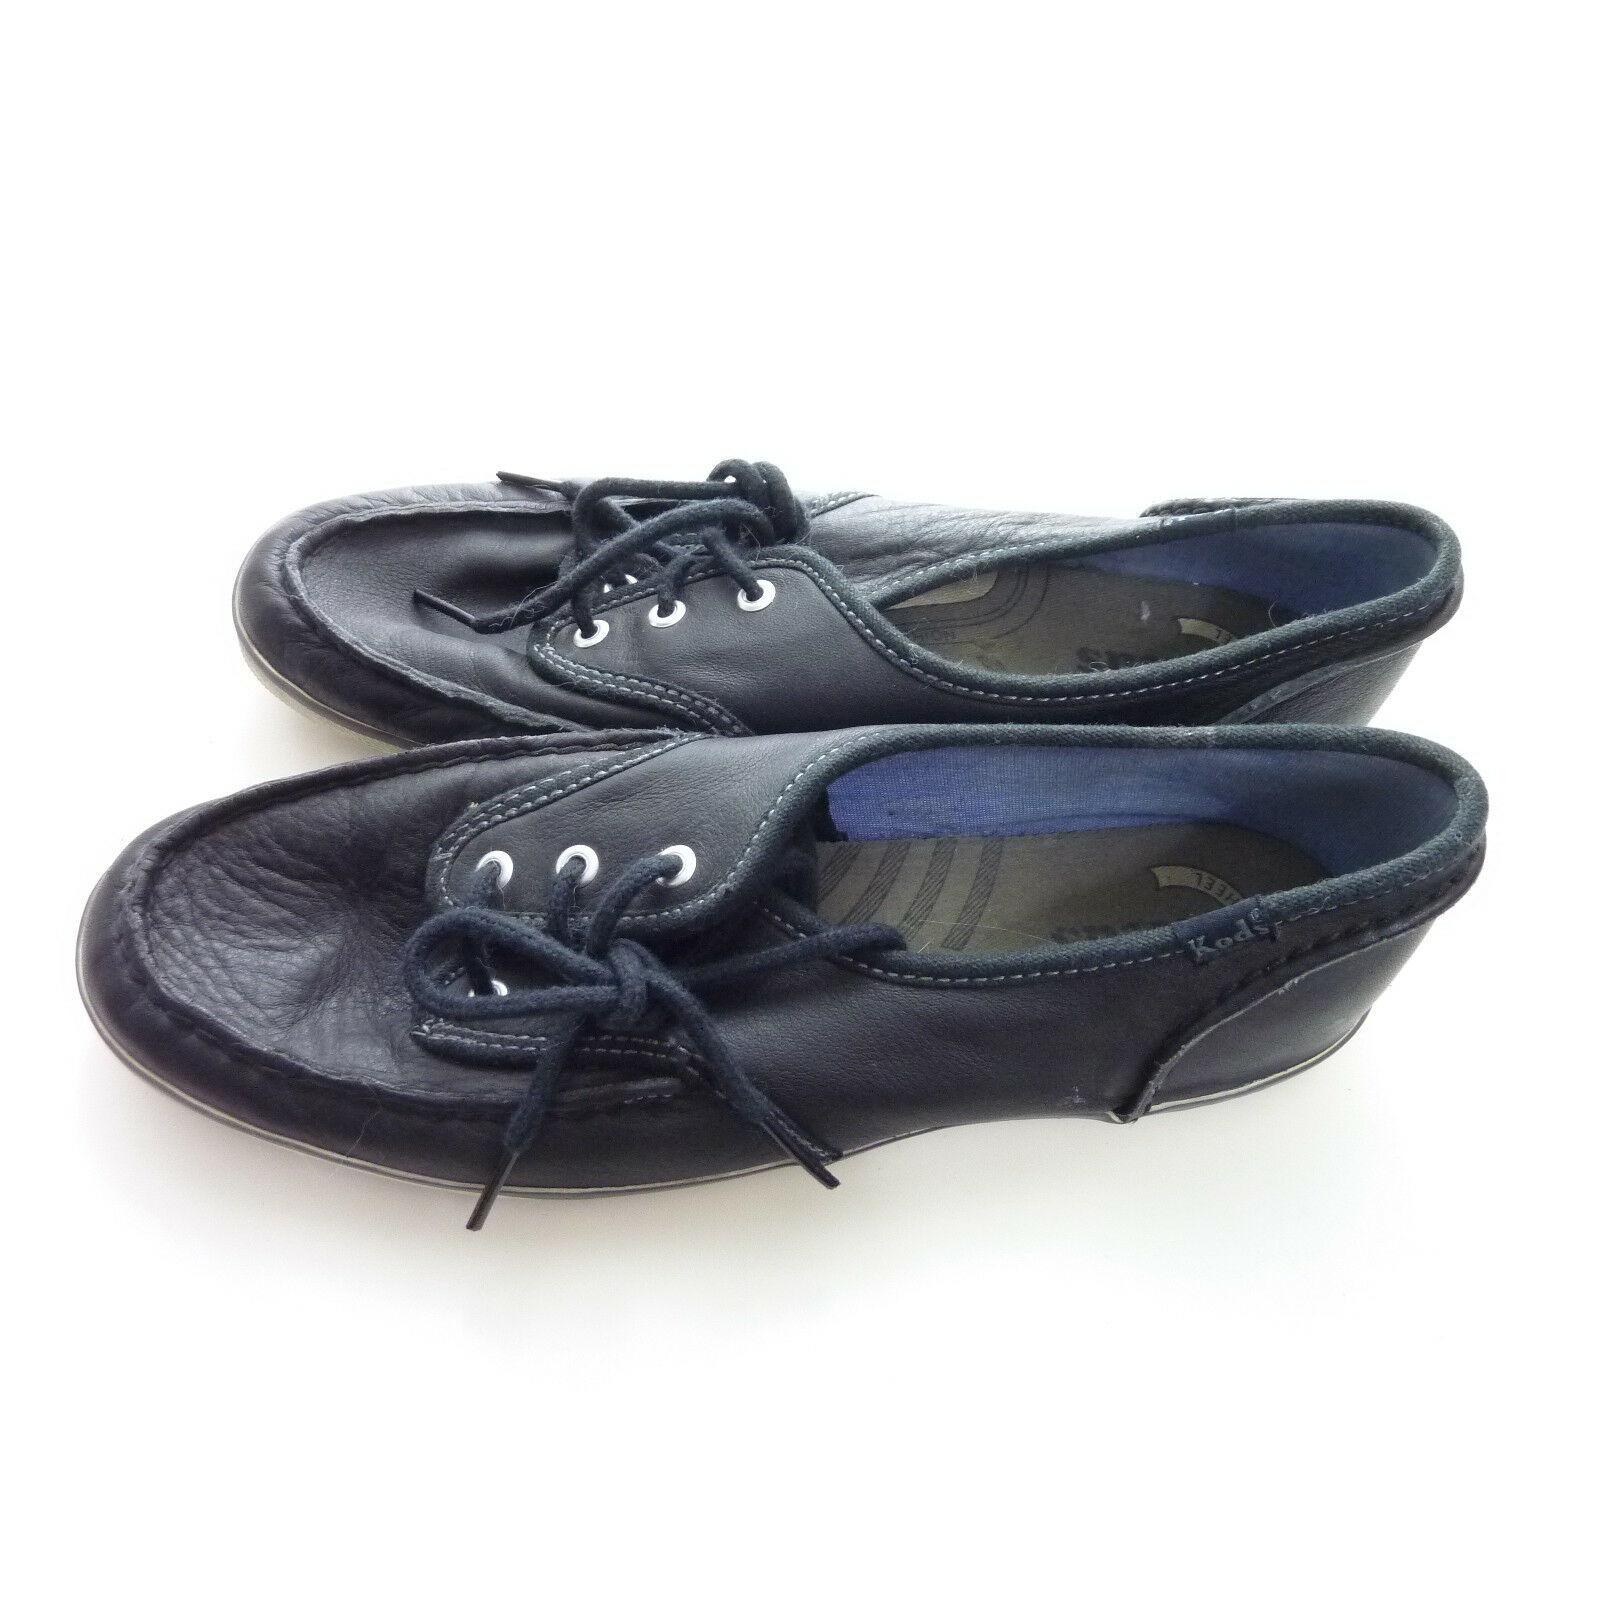 Keds Black Faux Leather Champion Boat Shoe Womens 8